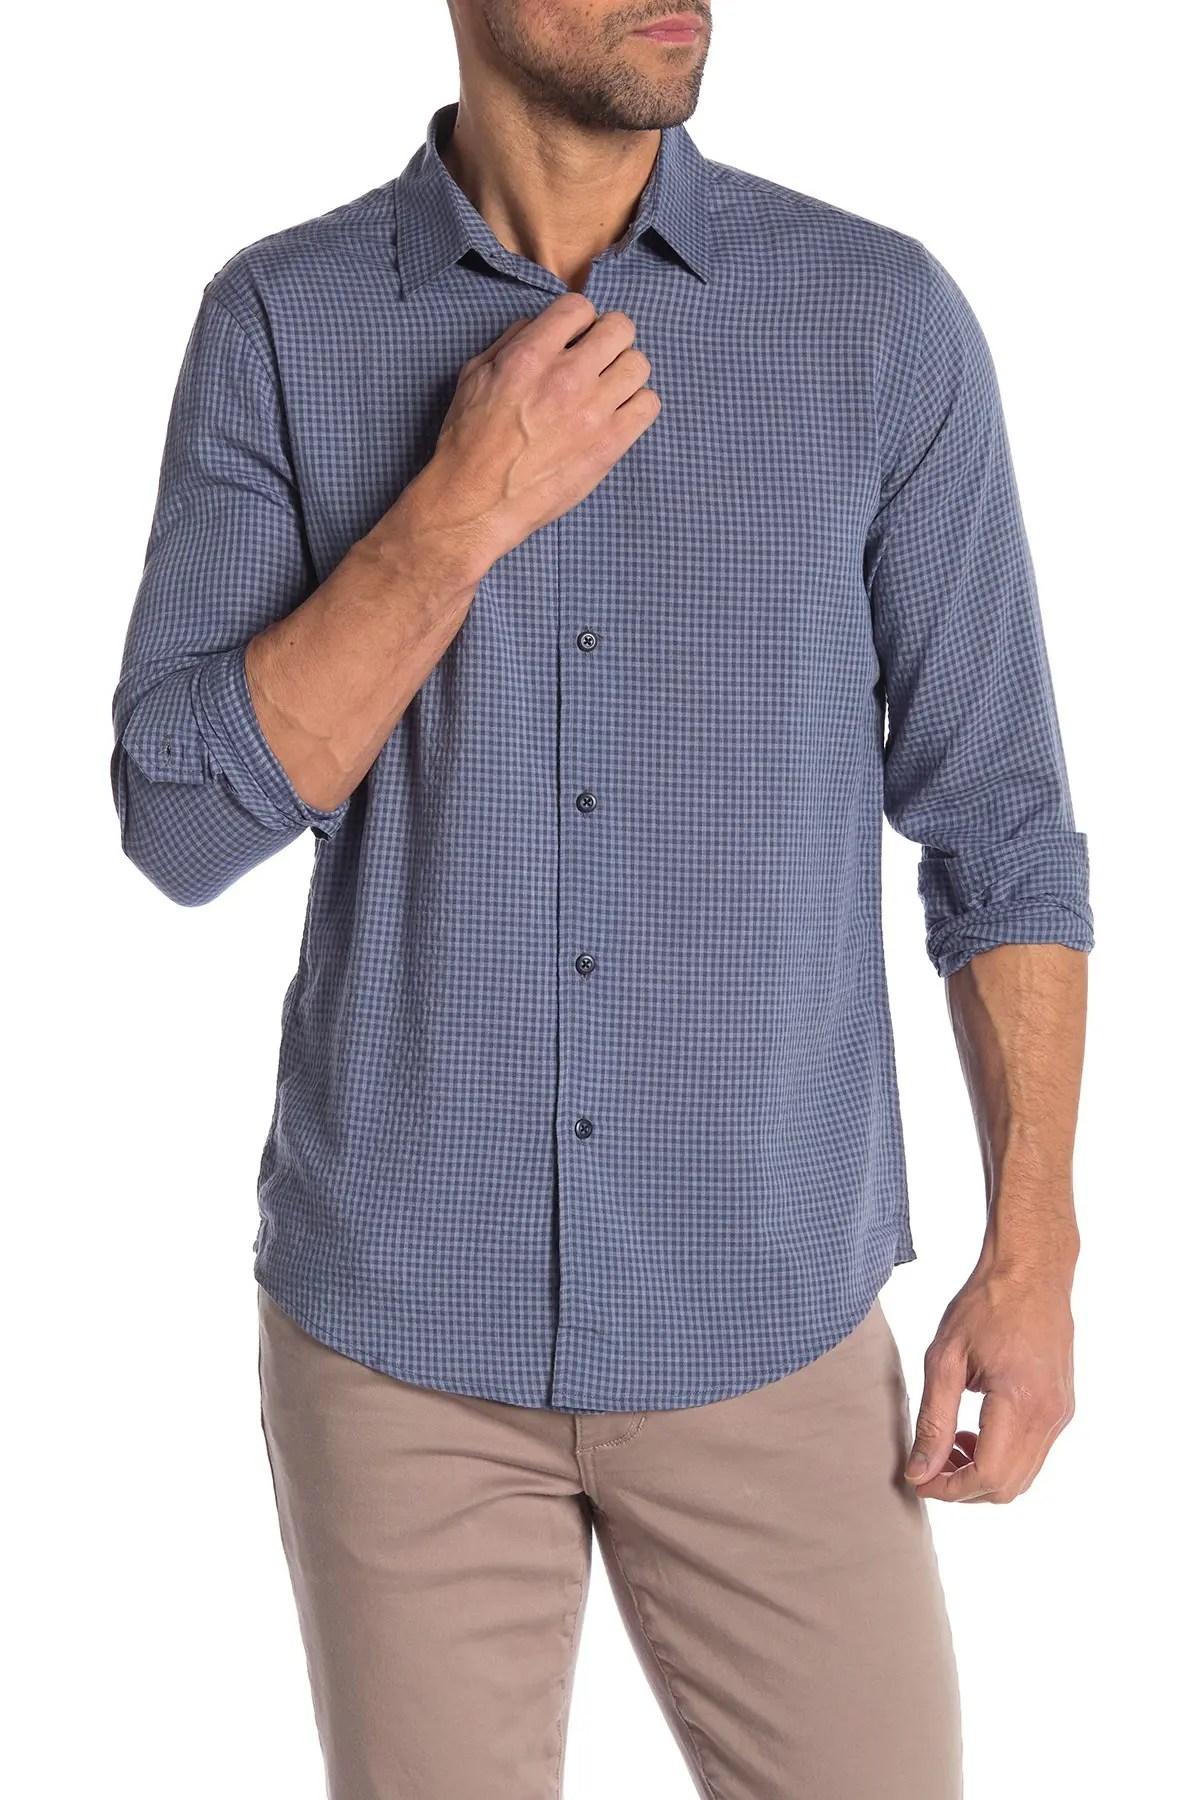 men s casual button down shirts